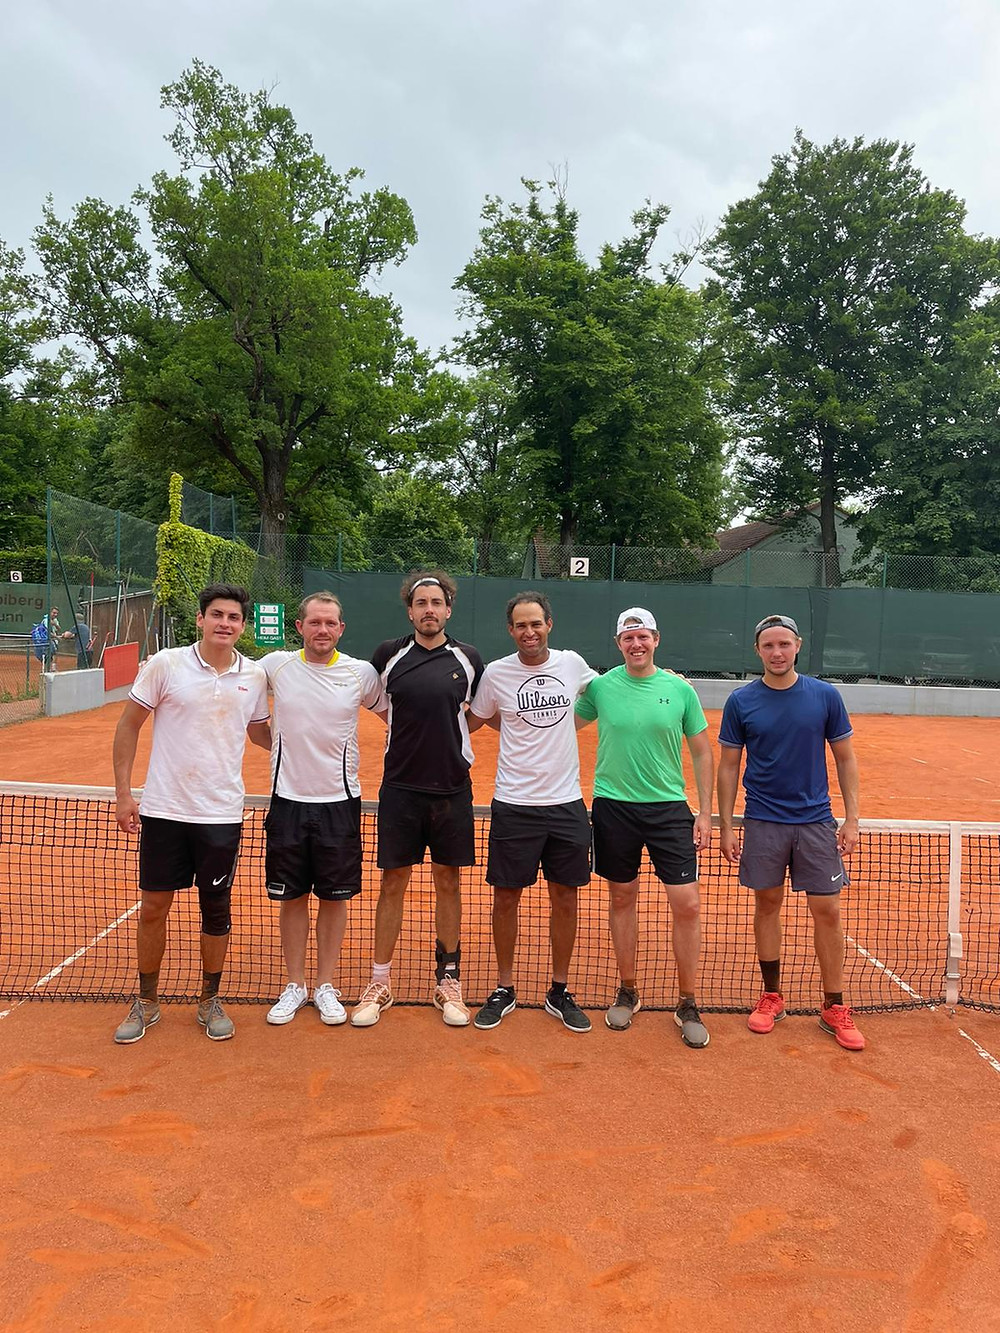 Herrenteam (von links: David Hendel, Pascal David, Vincent Schneider, Jordan Wenninger, Christian Bettinger, Daniel Köglmayr)